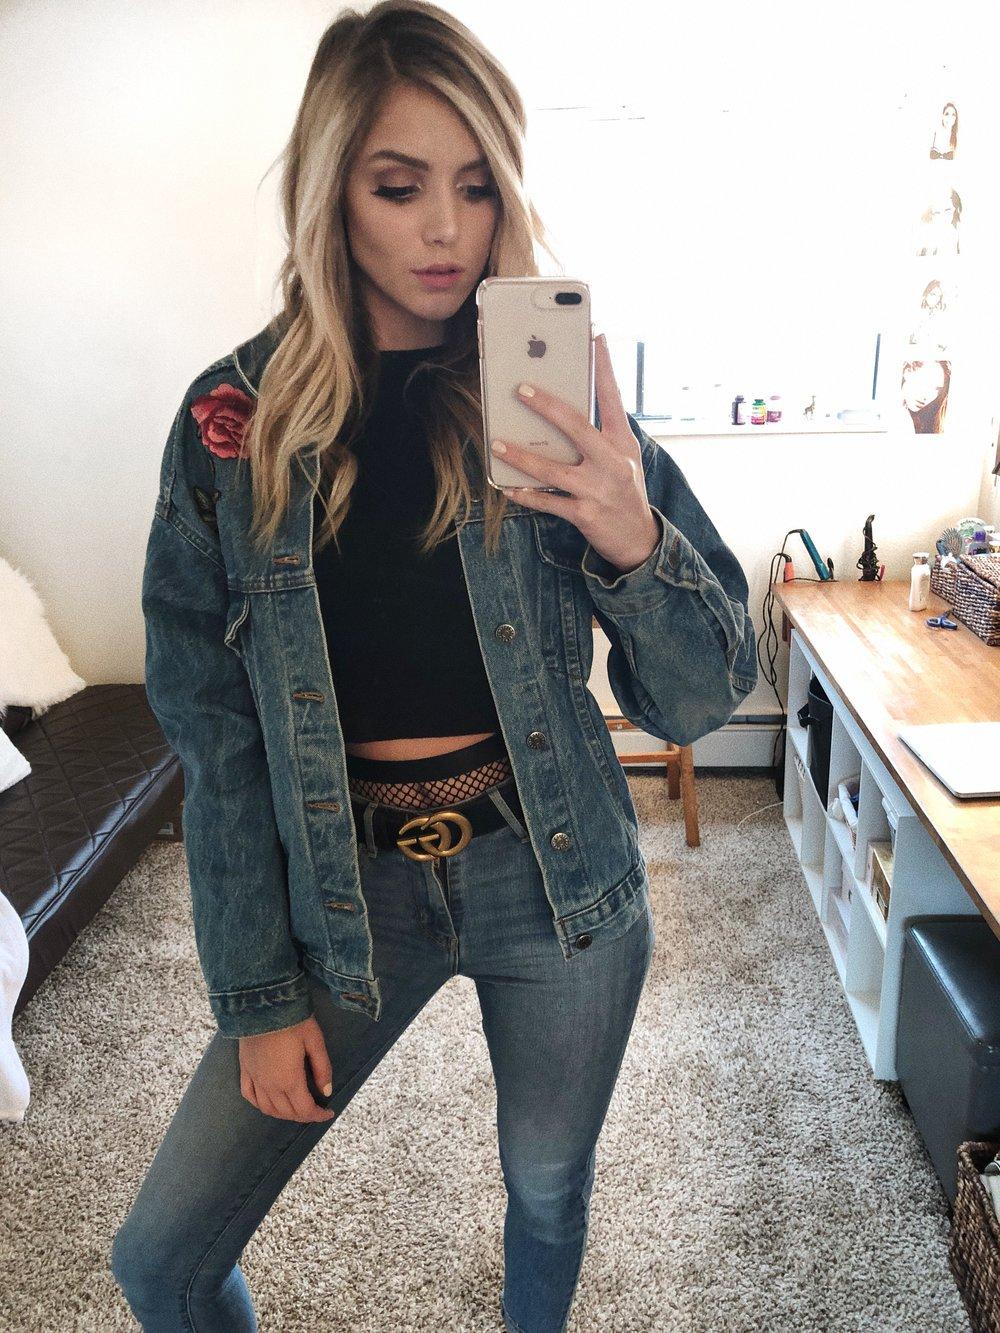 Wednesday - Jacket- Girl Shop LAShirt- BershkaFishnet underwear- Urban OutfittersBelt- GucciJeans- Levis